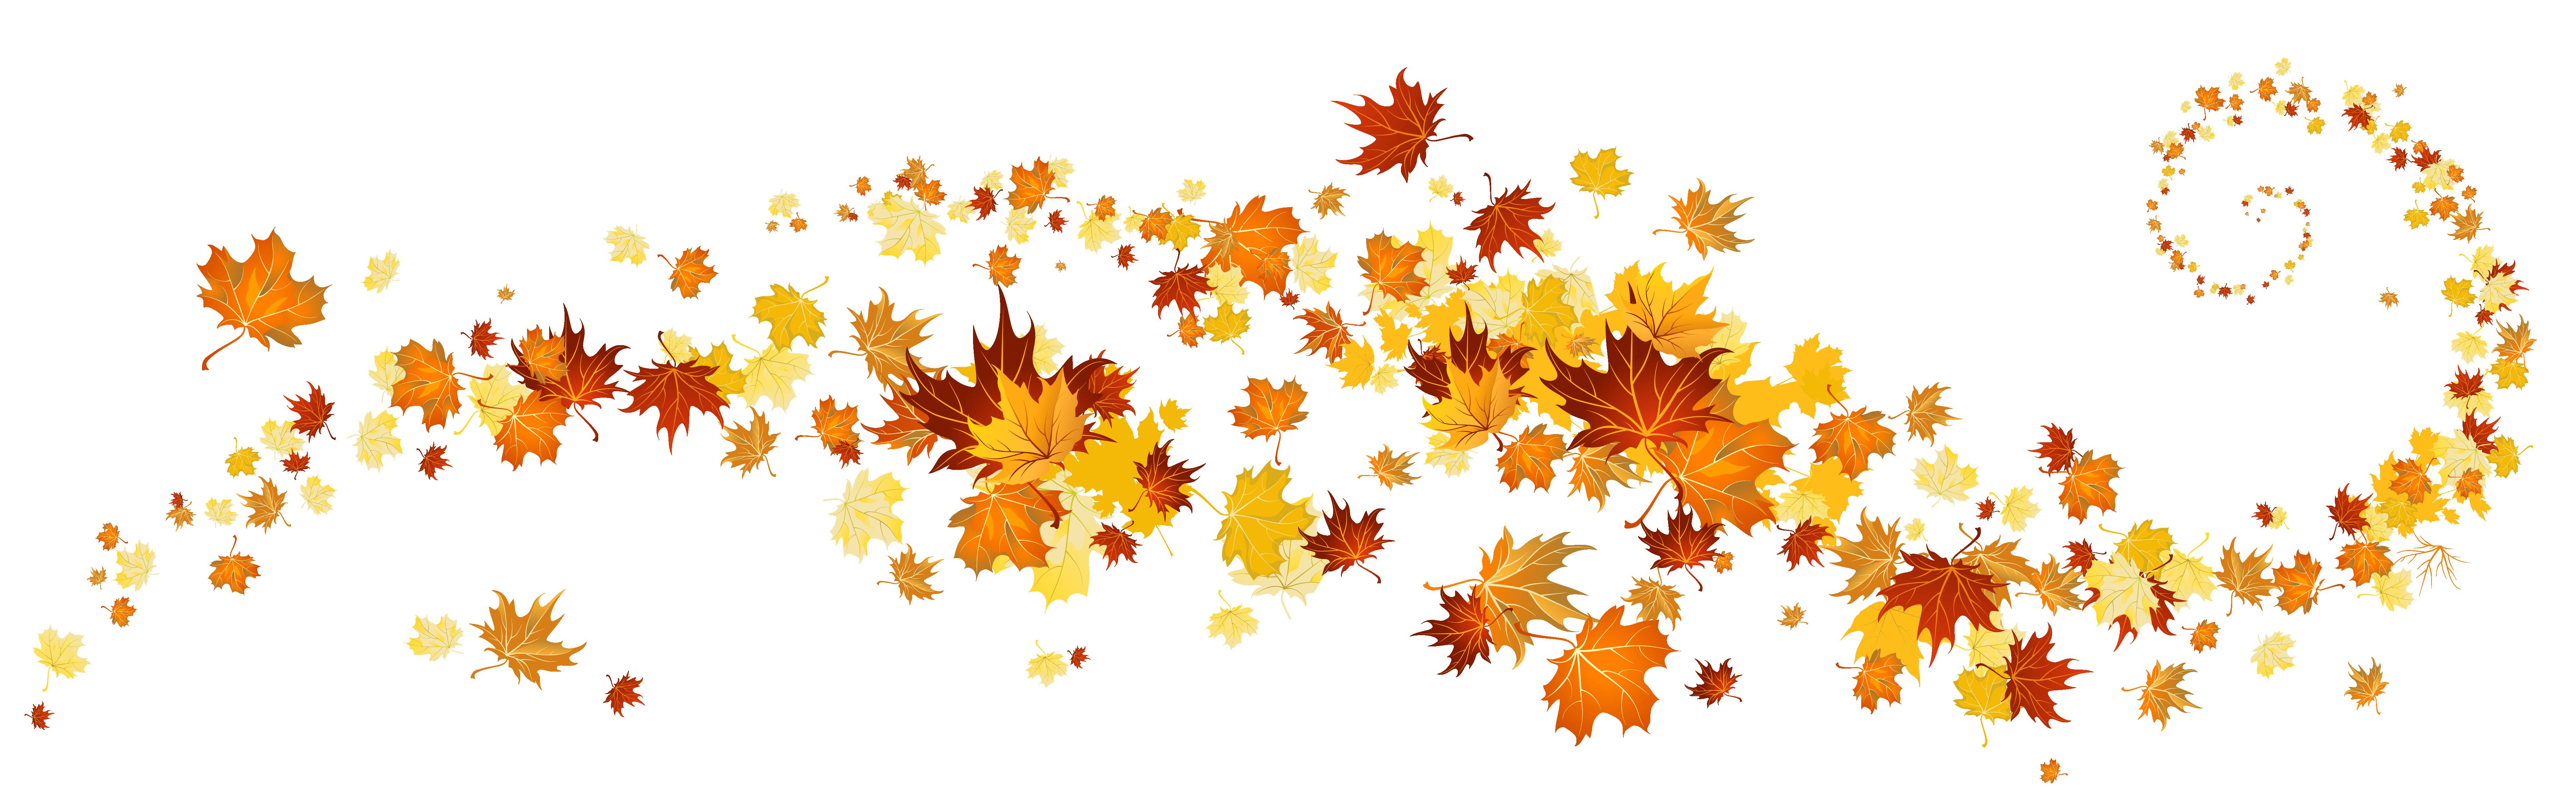 Free Fall Leaves Clip Art - Clipartall-Free Fall Leaves Clip Art - clipartall-16